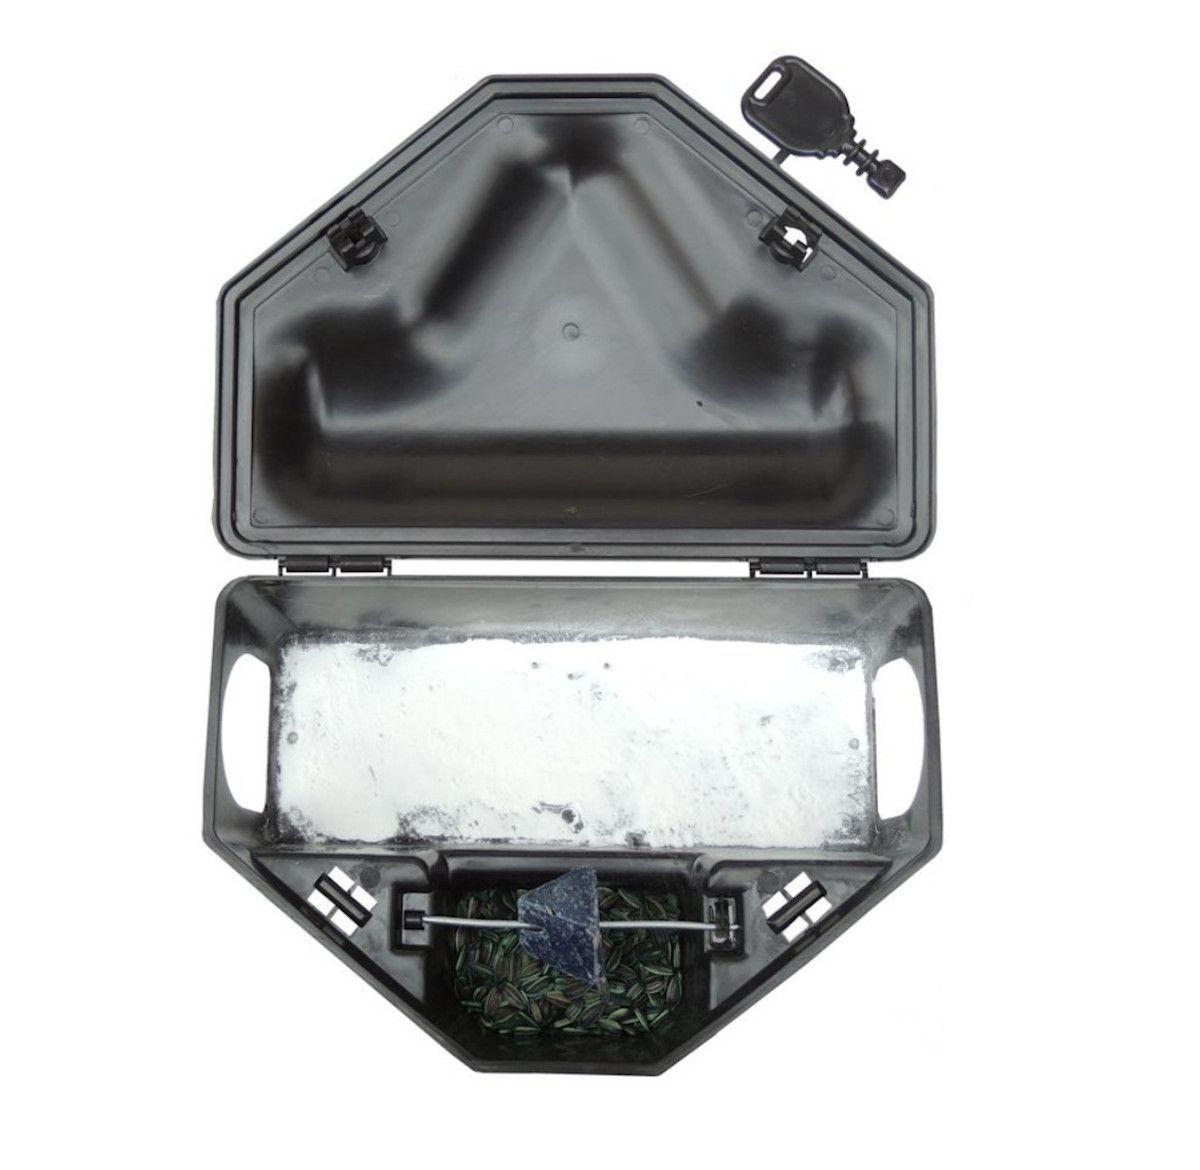 Kit 58 Porta Isca Com 2 Chaves - Duplo Travamento